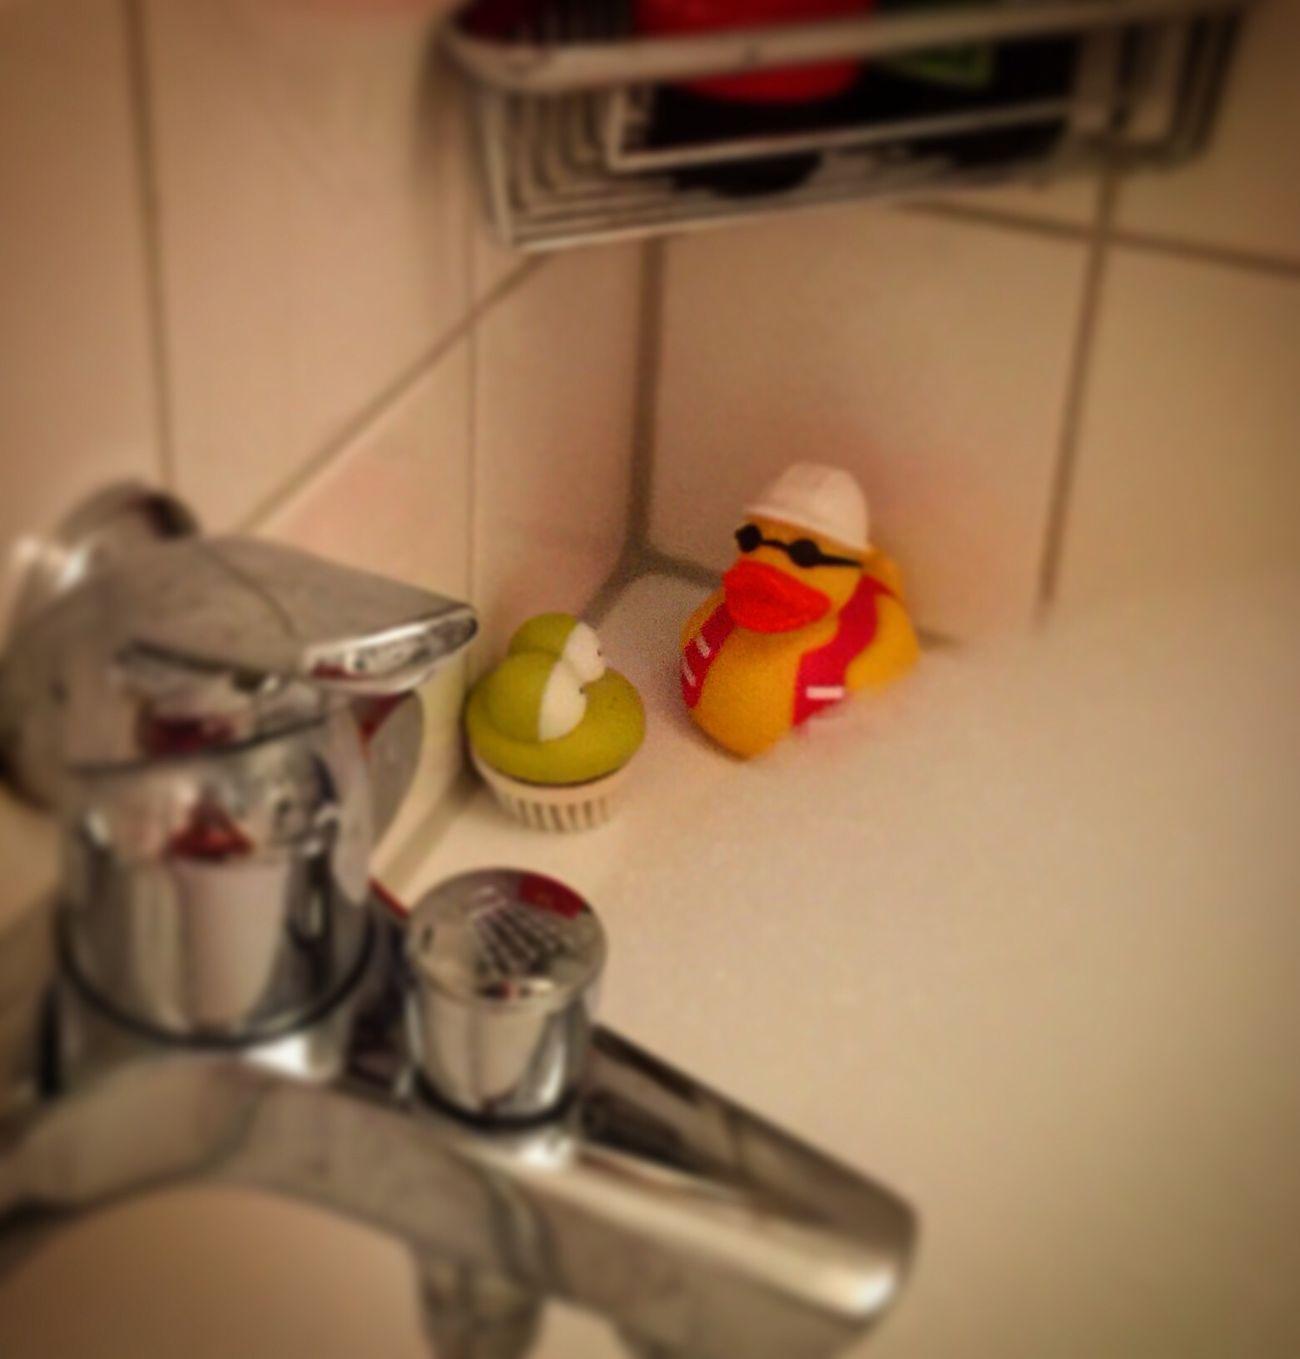 Bathtime Bathroom Quietscheente Schaumbad Foam Badezimmer Relaxing Moments Relaxing